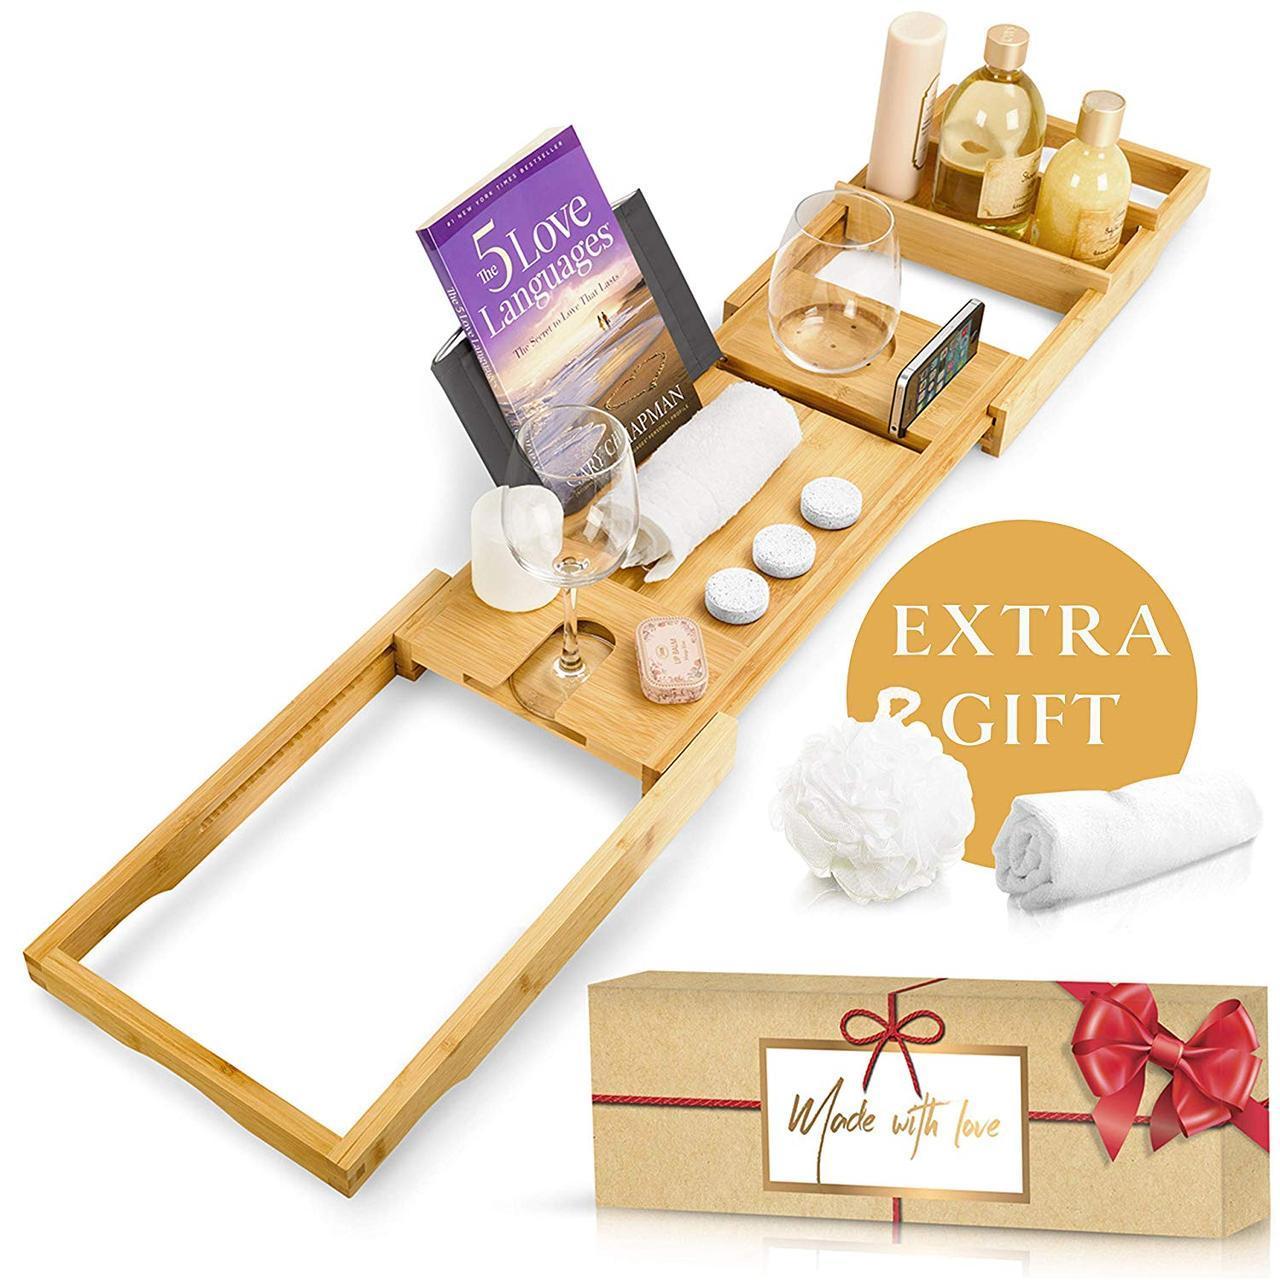 Столик для ванны Royal Bathtub Tray Set, бамбуковый